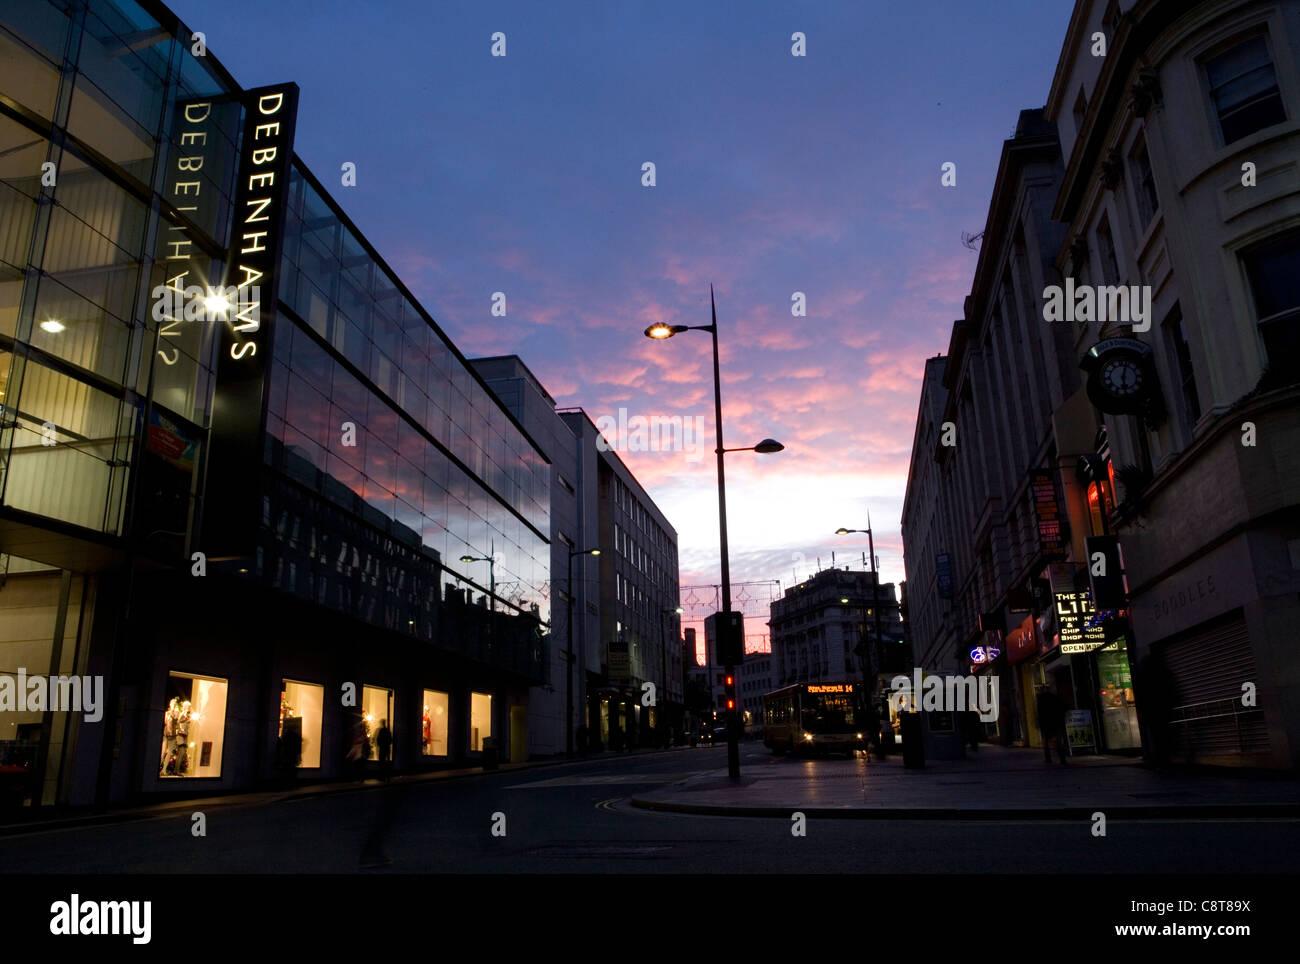 Manchester centre shops at dusk - Stock Image